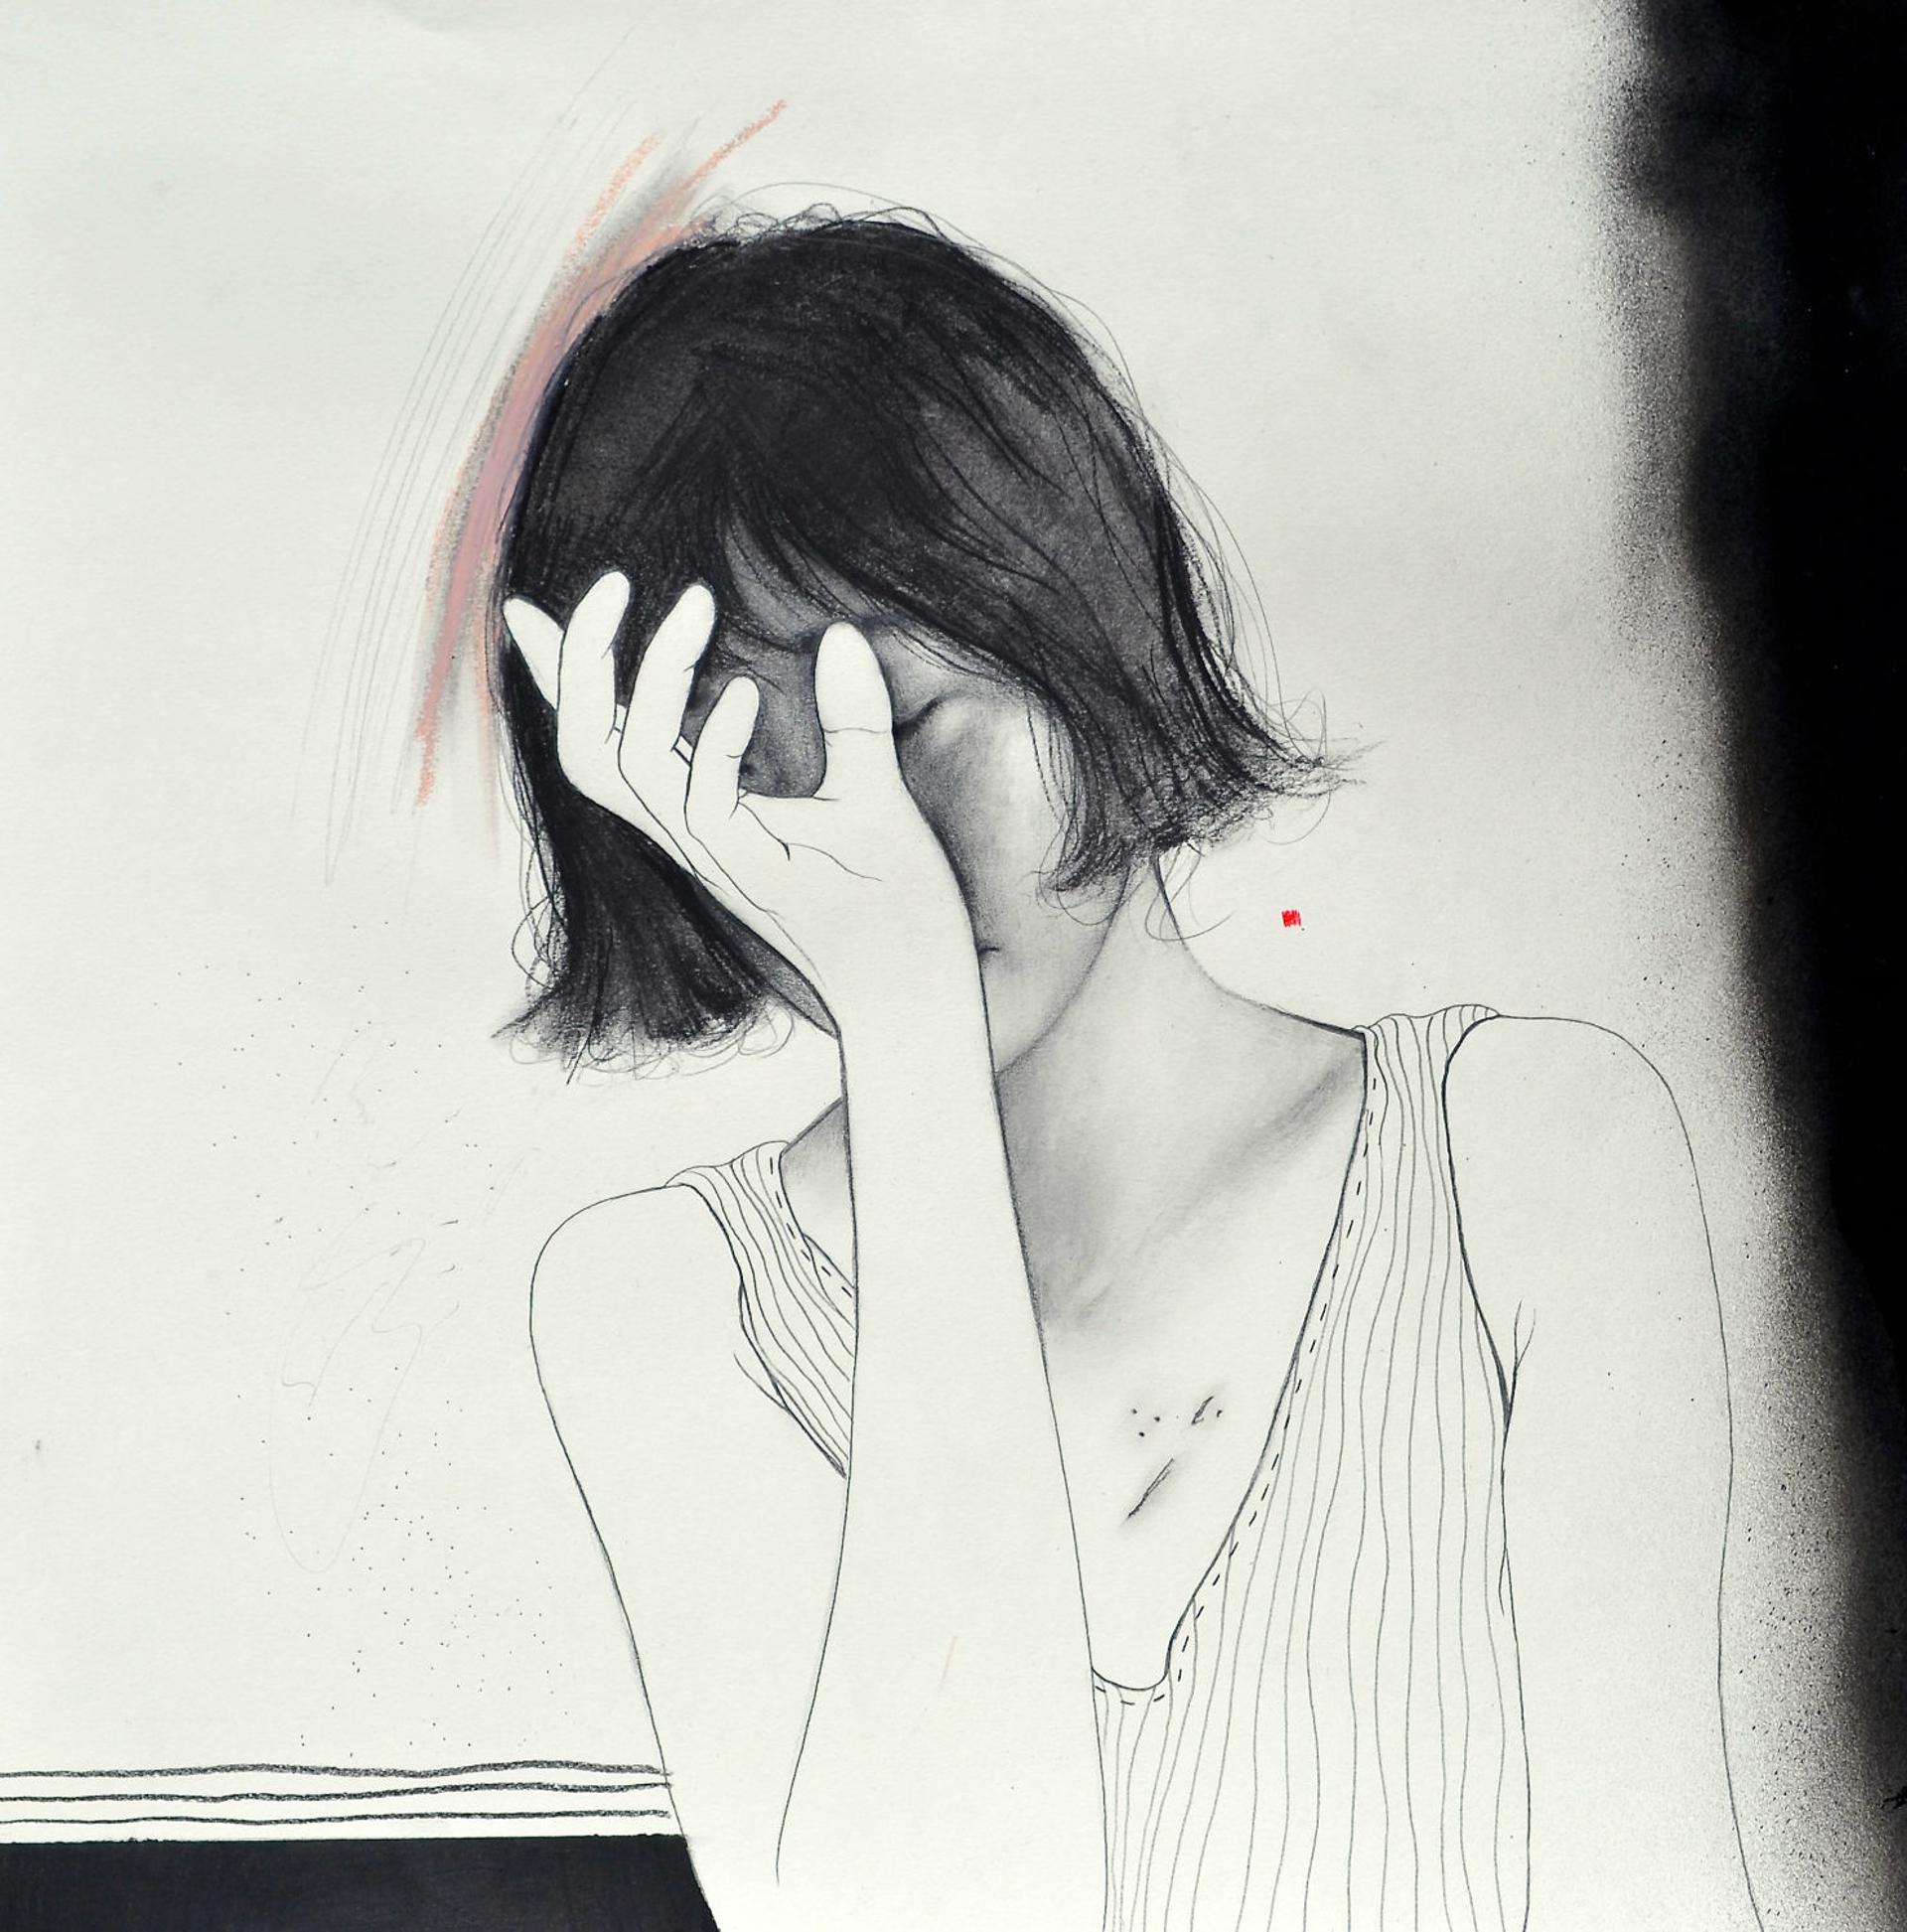 Veil by Daniel Segrove